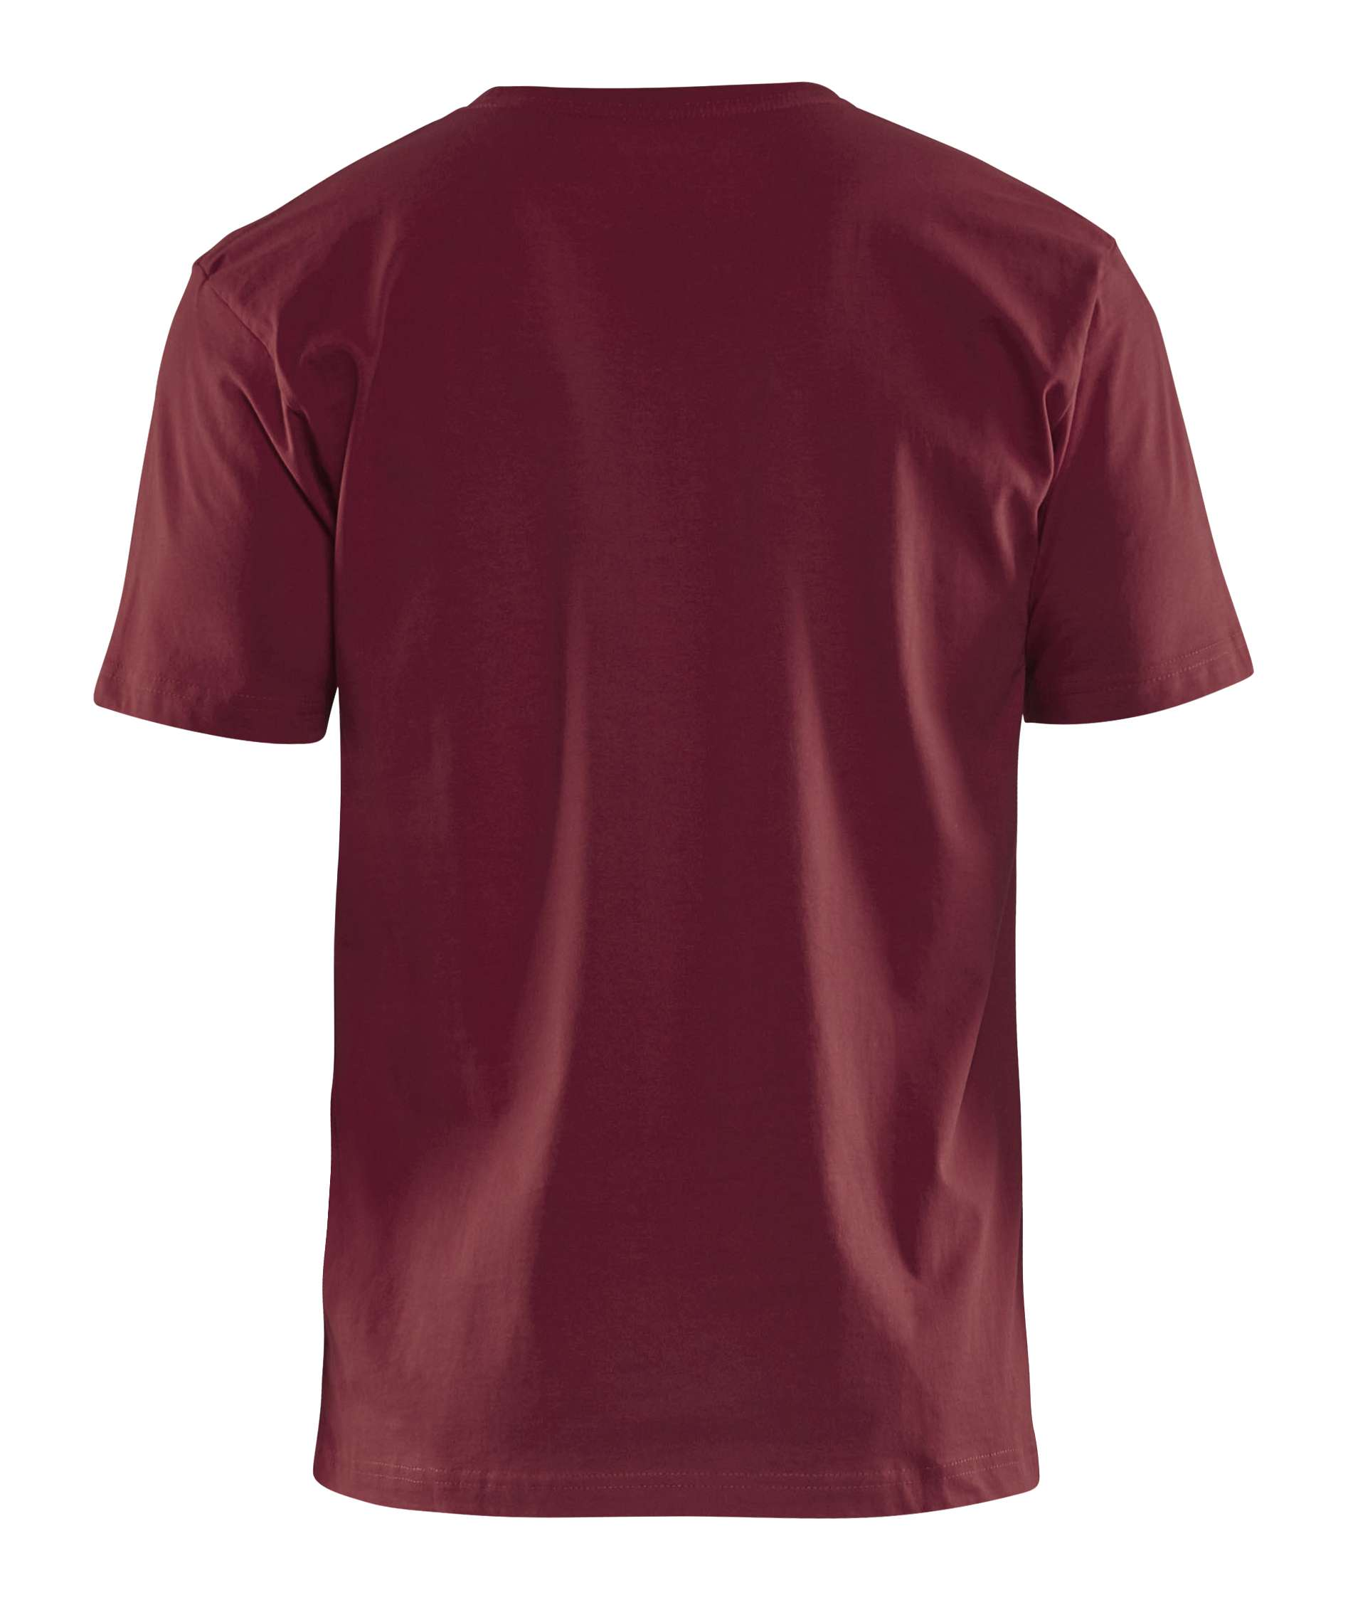 Blaklader T-shirts 33001030 bordeauxrood(5700)